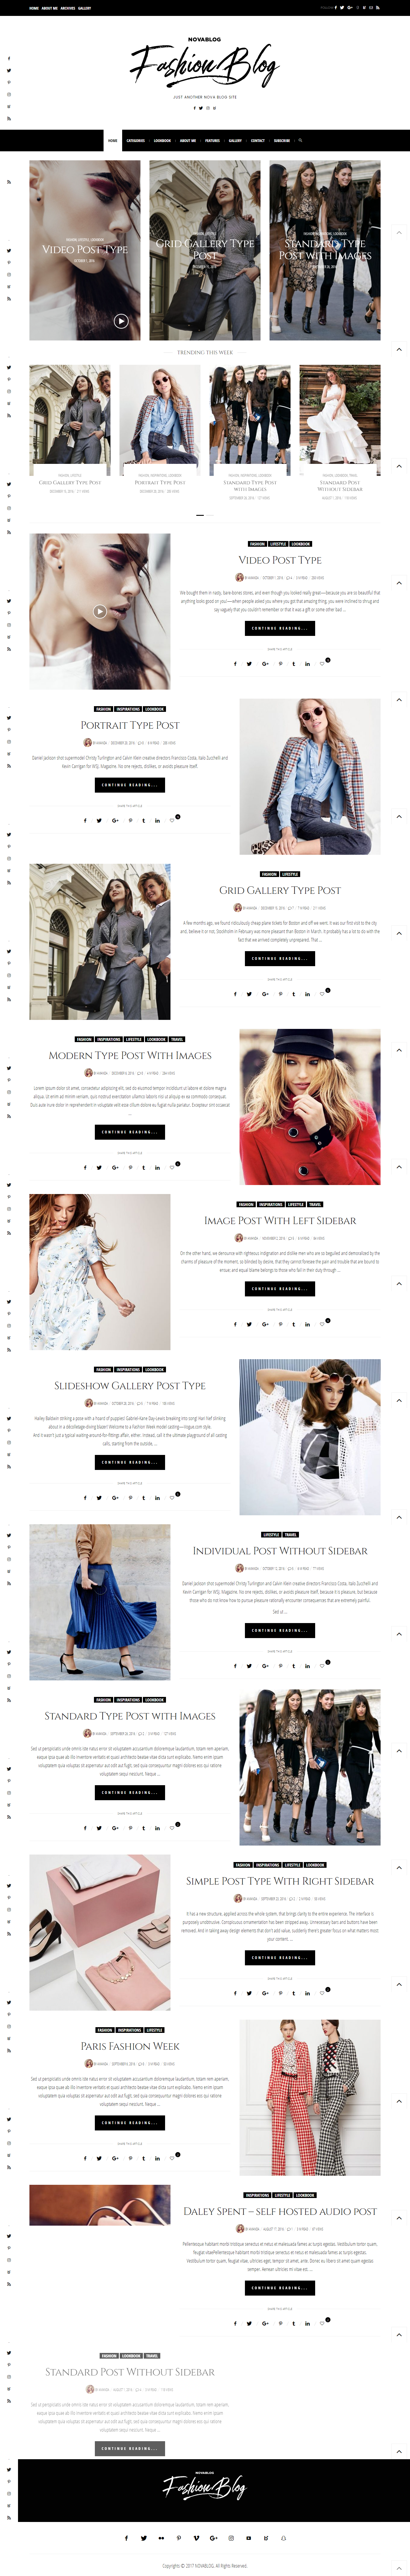 NovaBlog - Multi-Concept Blog / Magazine WordPress Theme | Blog ...